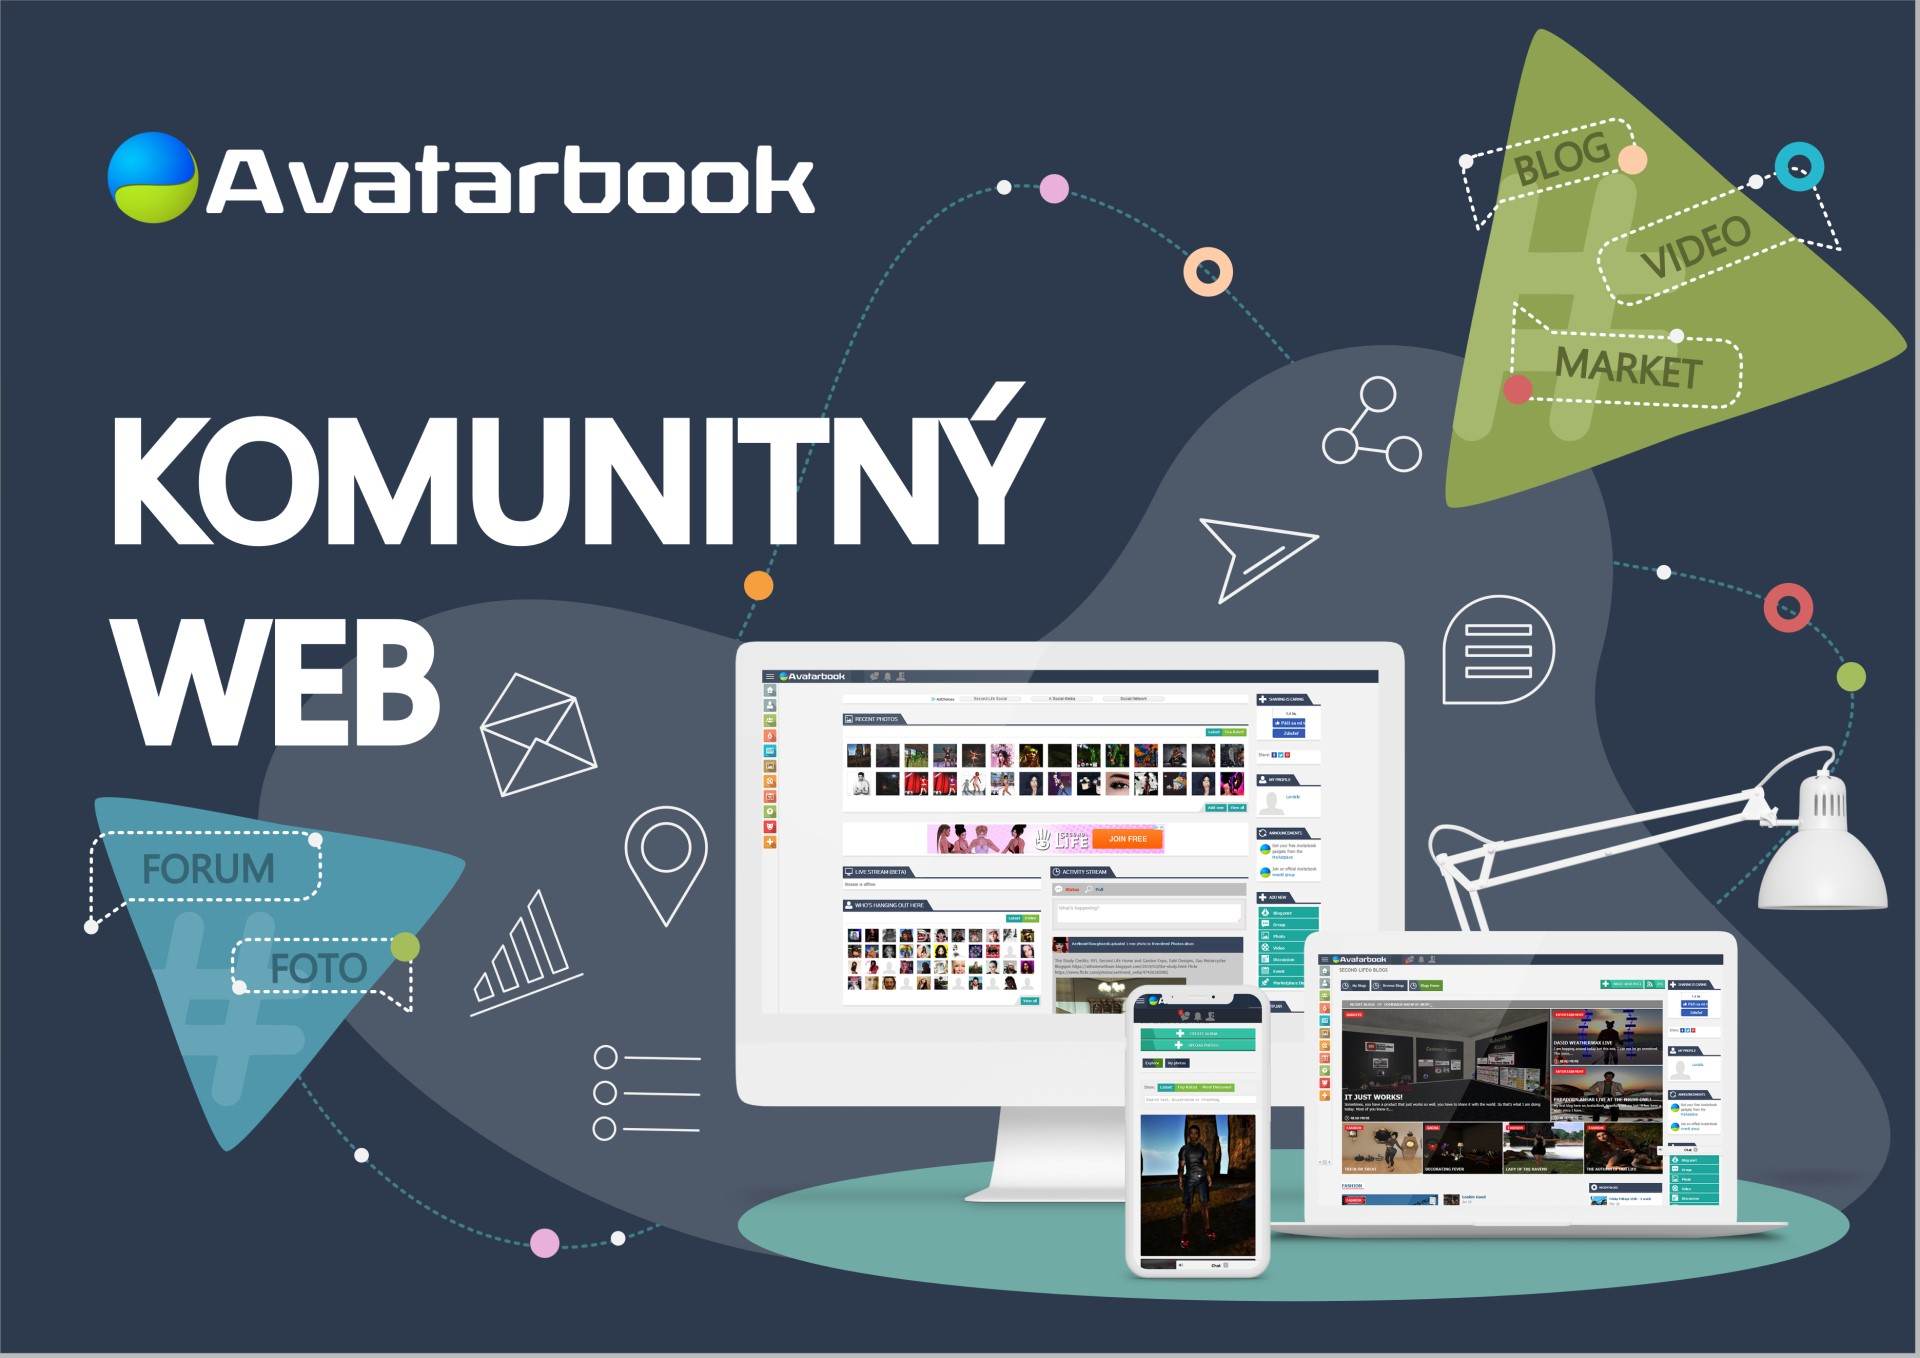 avatarbook web mockup